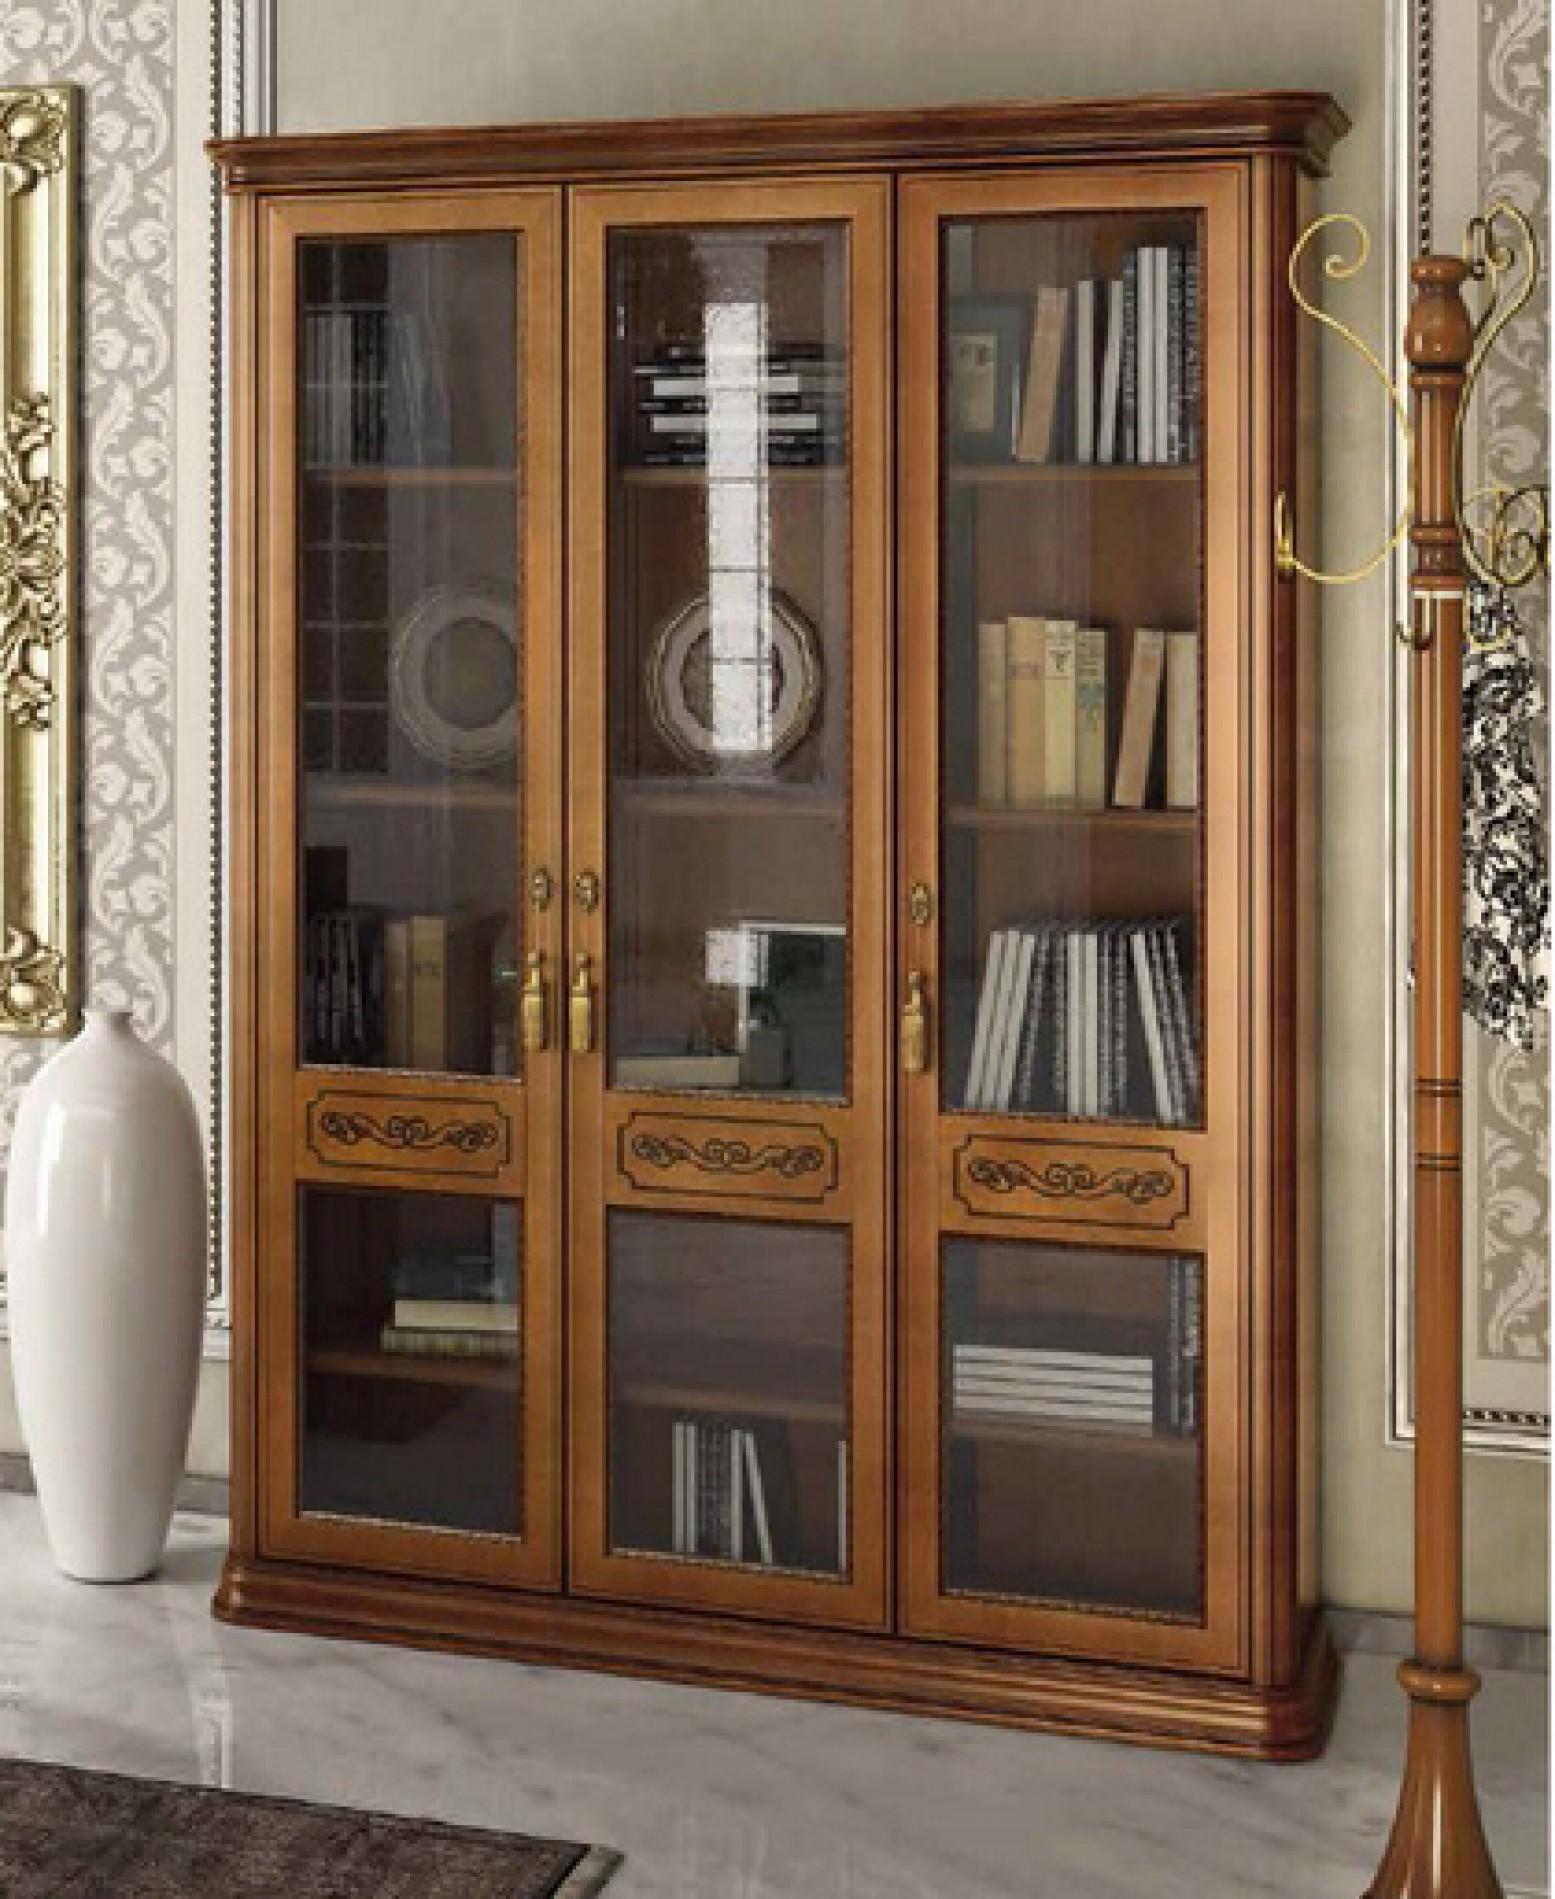 Gl Doors Wooden Shelves Walnut